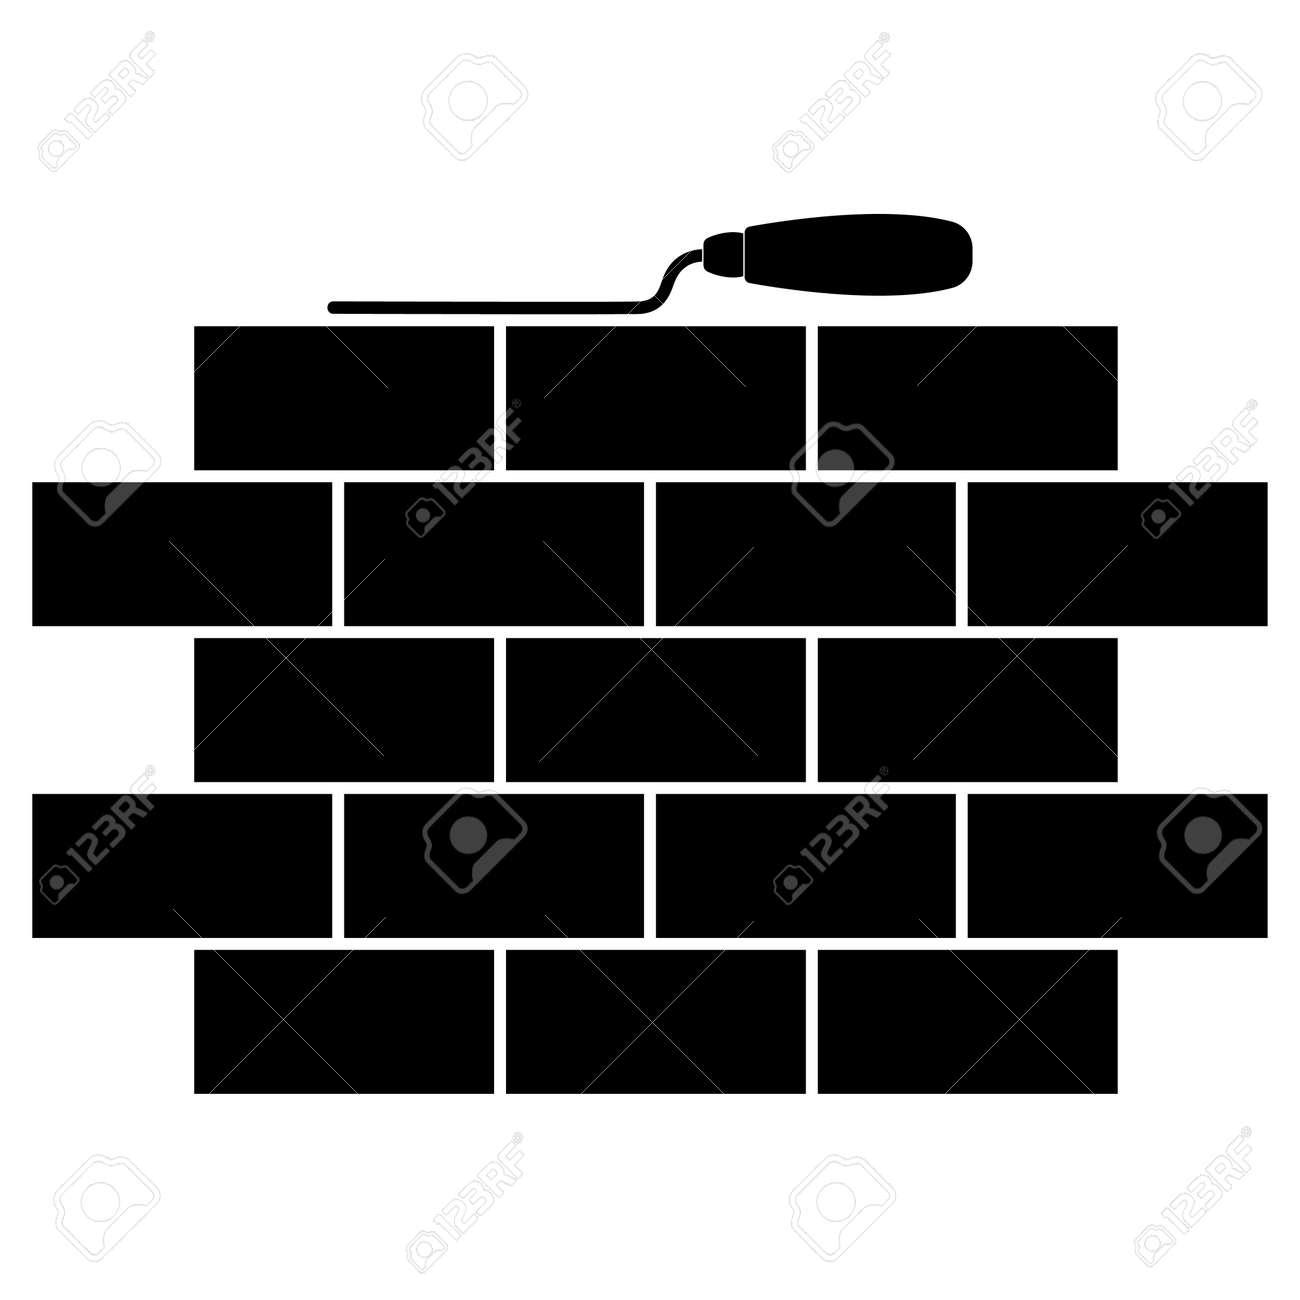 brickwork and building trowel icon masonry flat logo simple rh 123rf com masonic logos and emblems masonry logos free